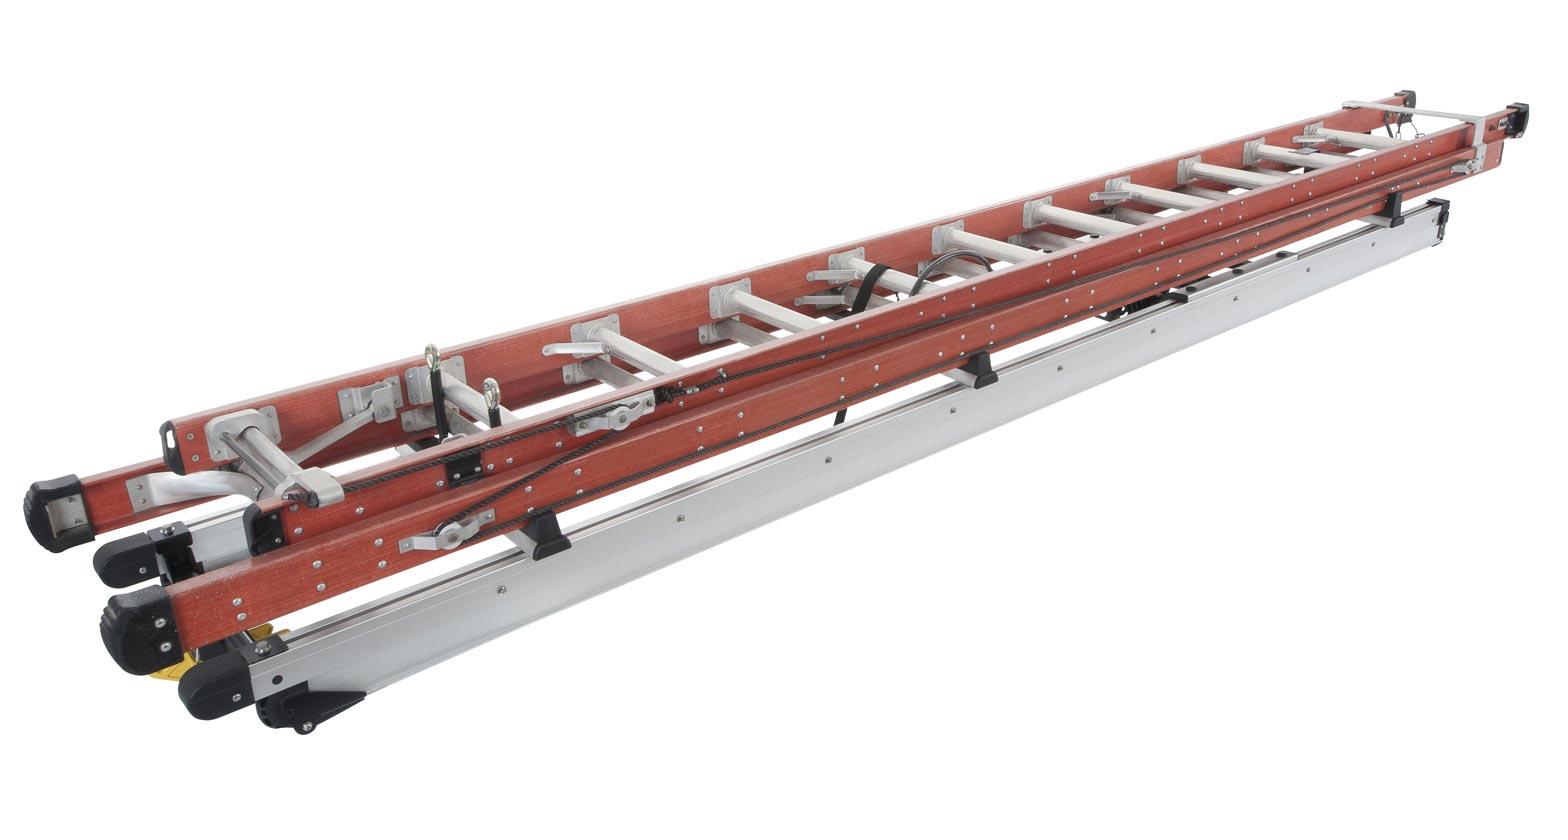 Ja0472 Ohs Ladder Loader 3 Bar Roof Rack Rhino Rack